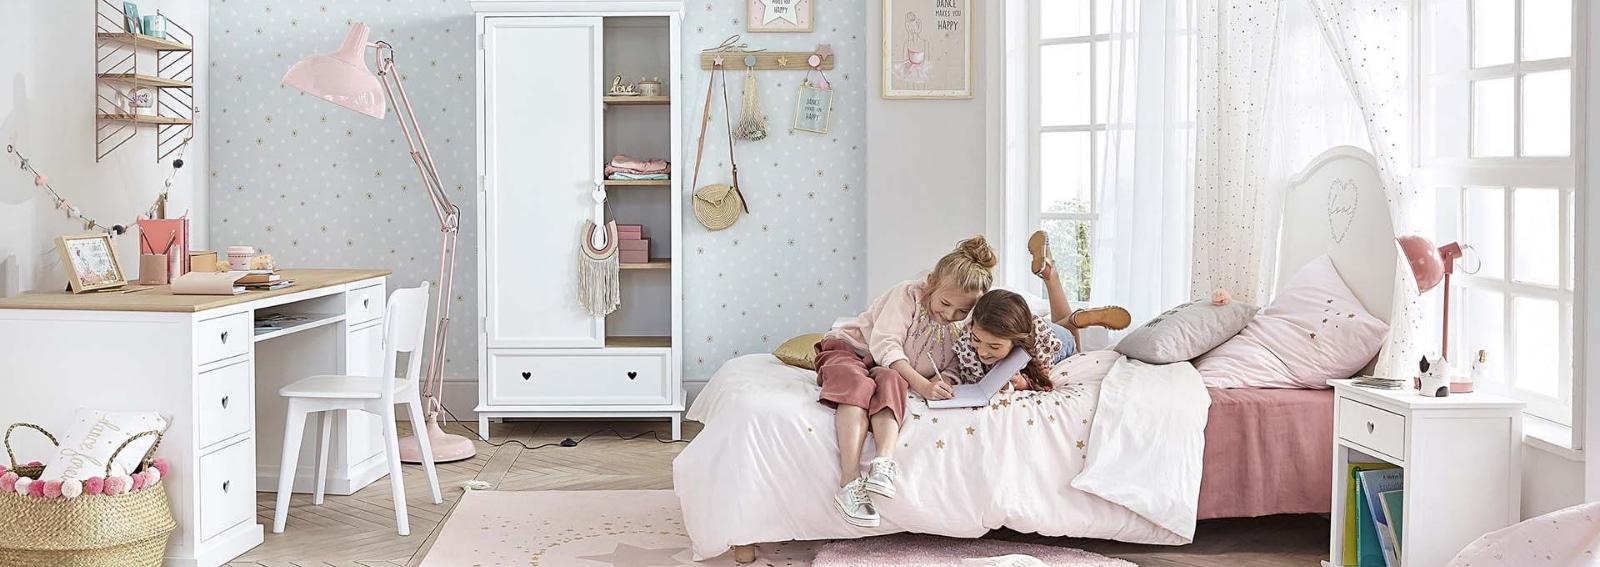 Maisons du monde camera bambini_desktop